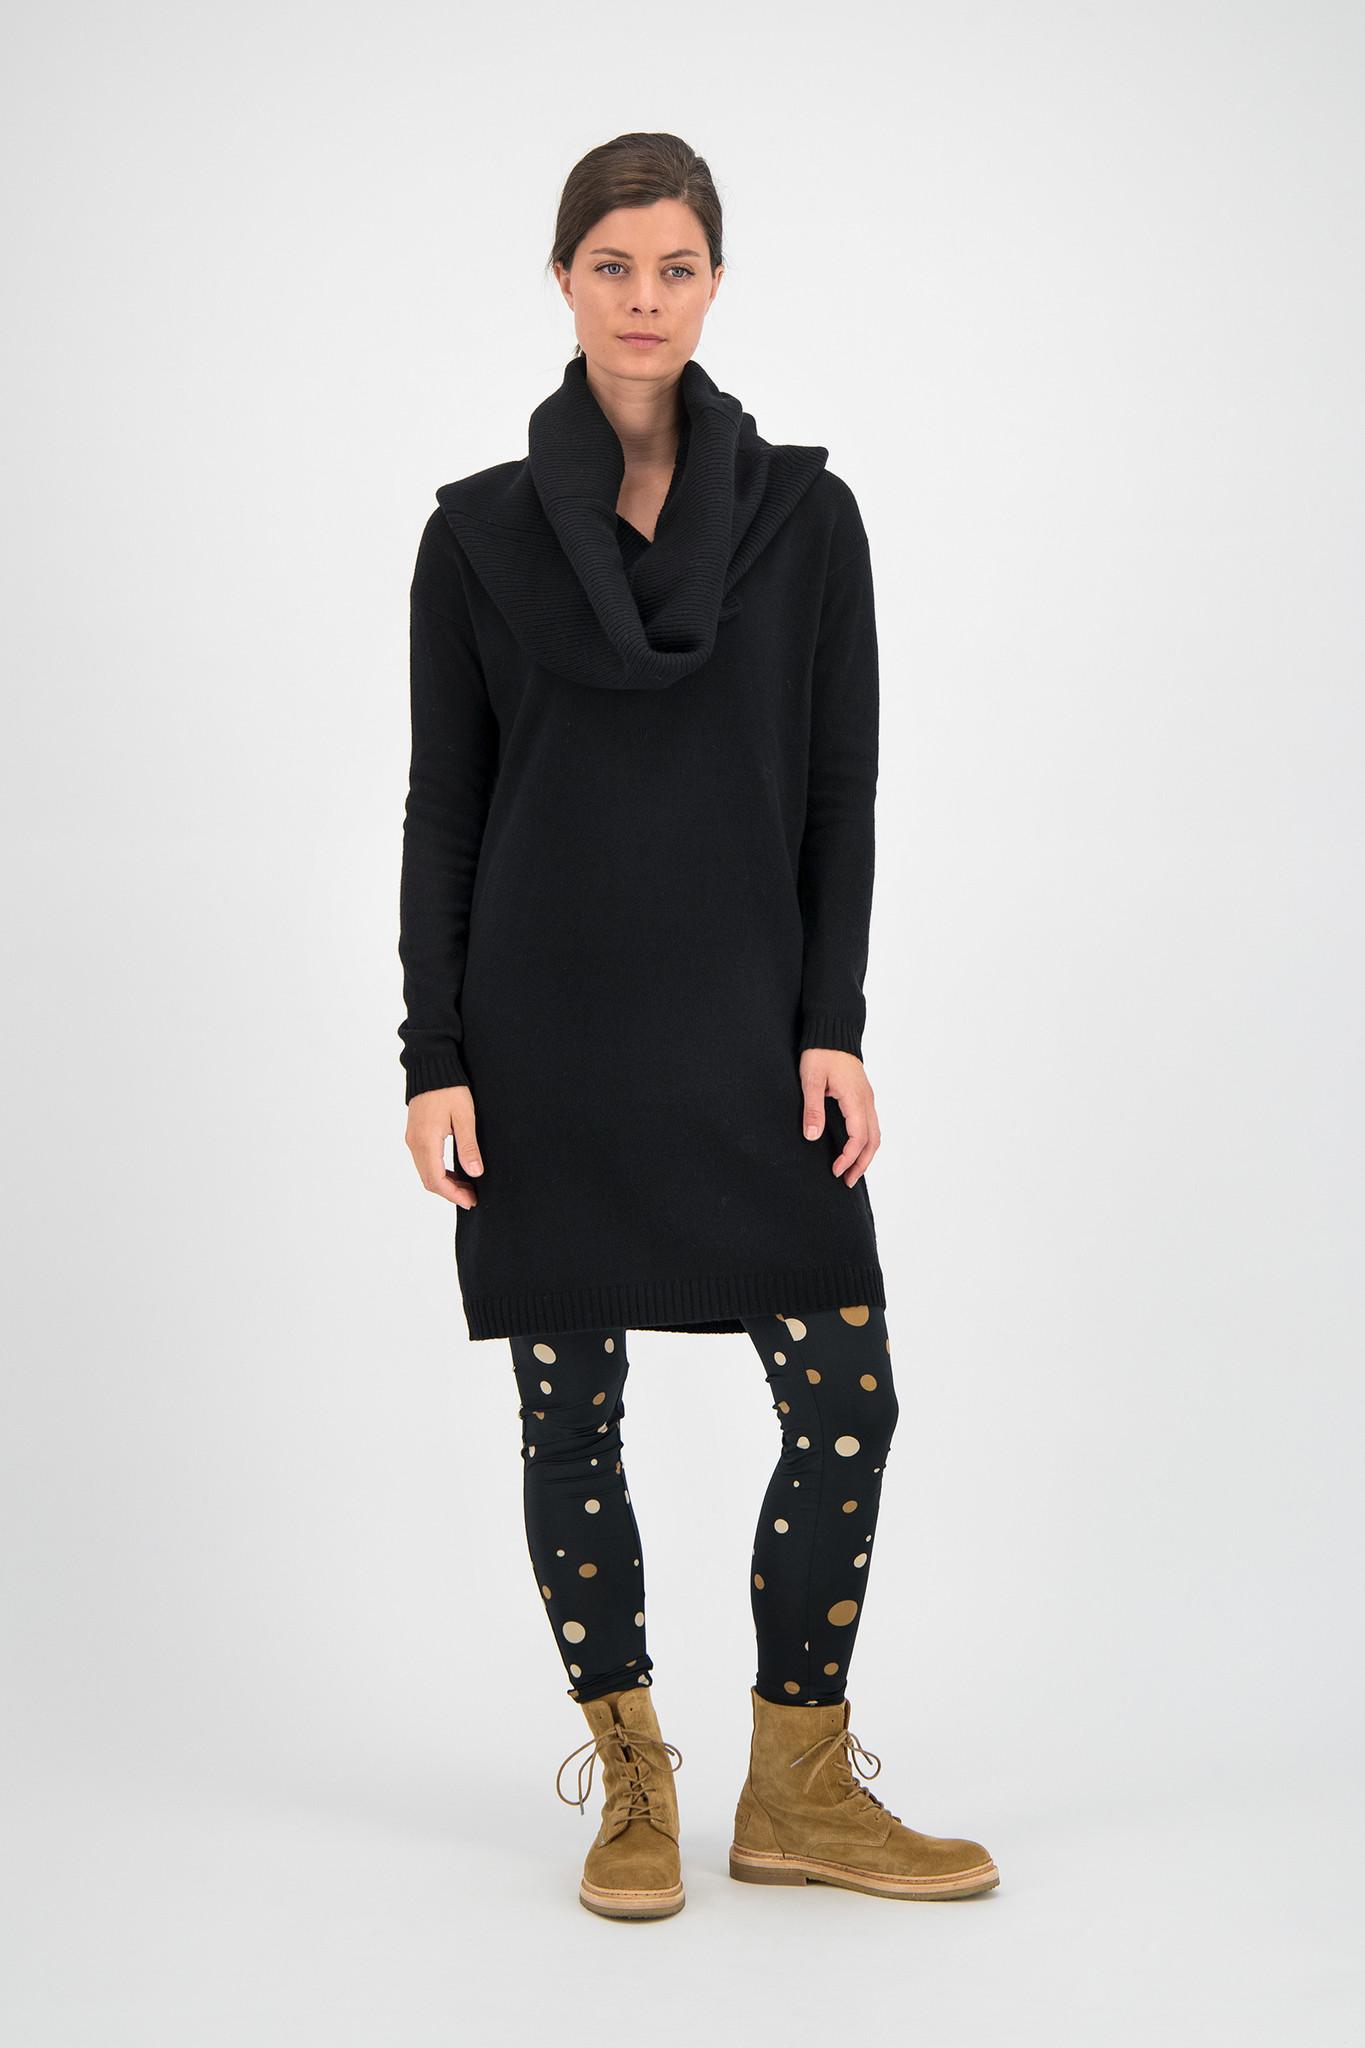 SYLVER Merino Mix Dress - Black